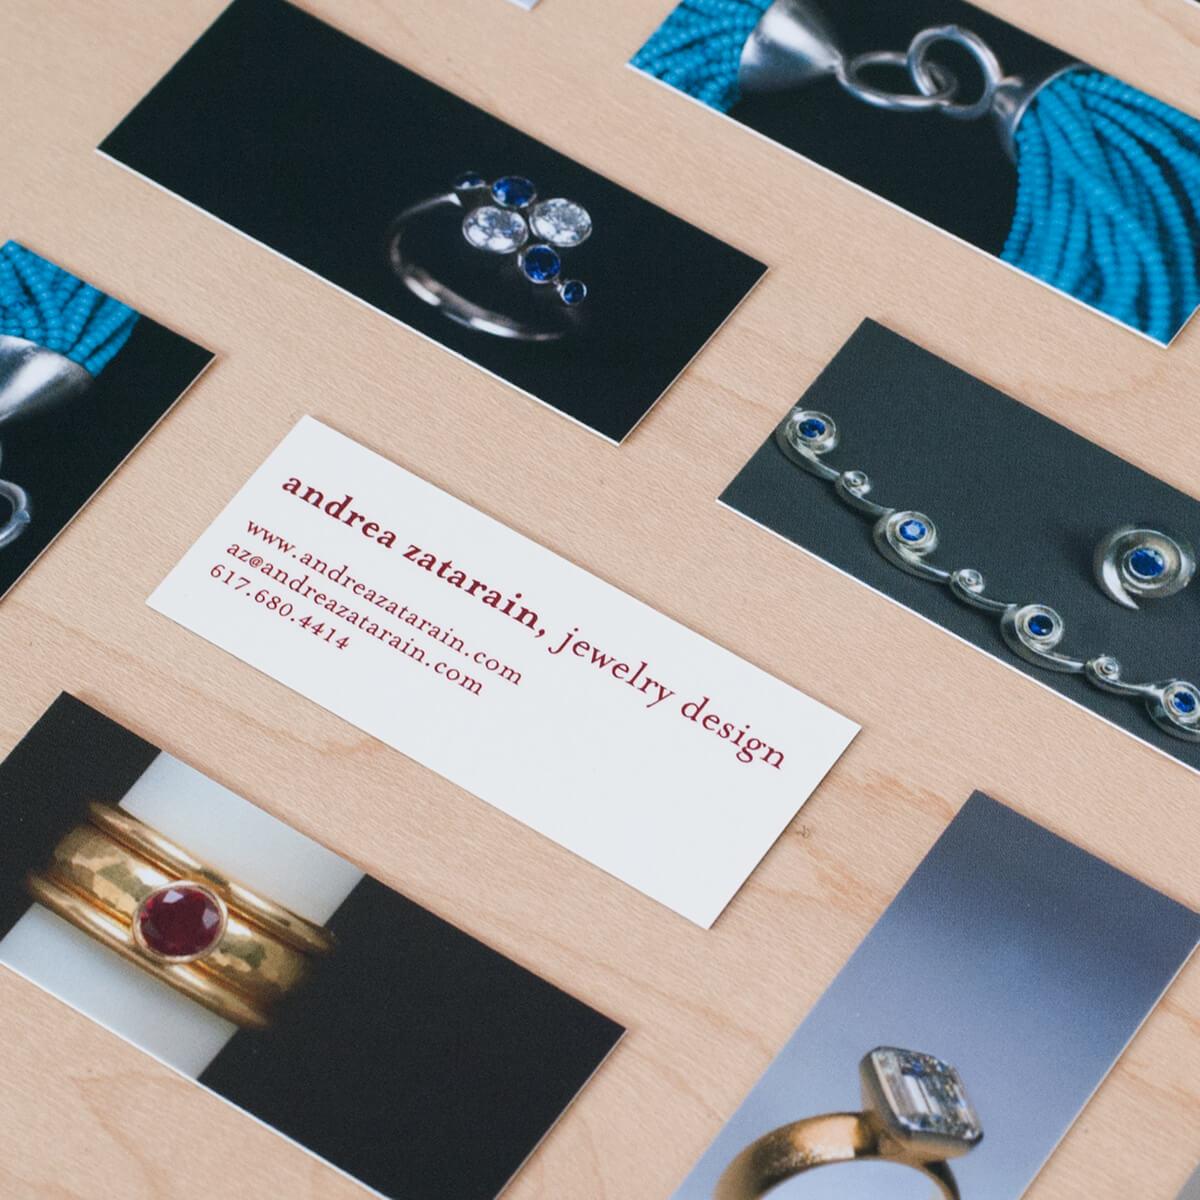 Mini business cards for Andrea Zatarain   Design by  ChrisAndAndy.com